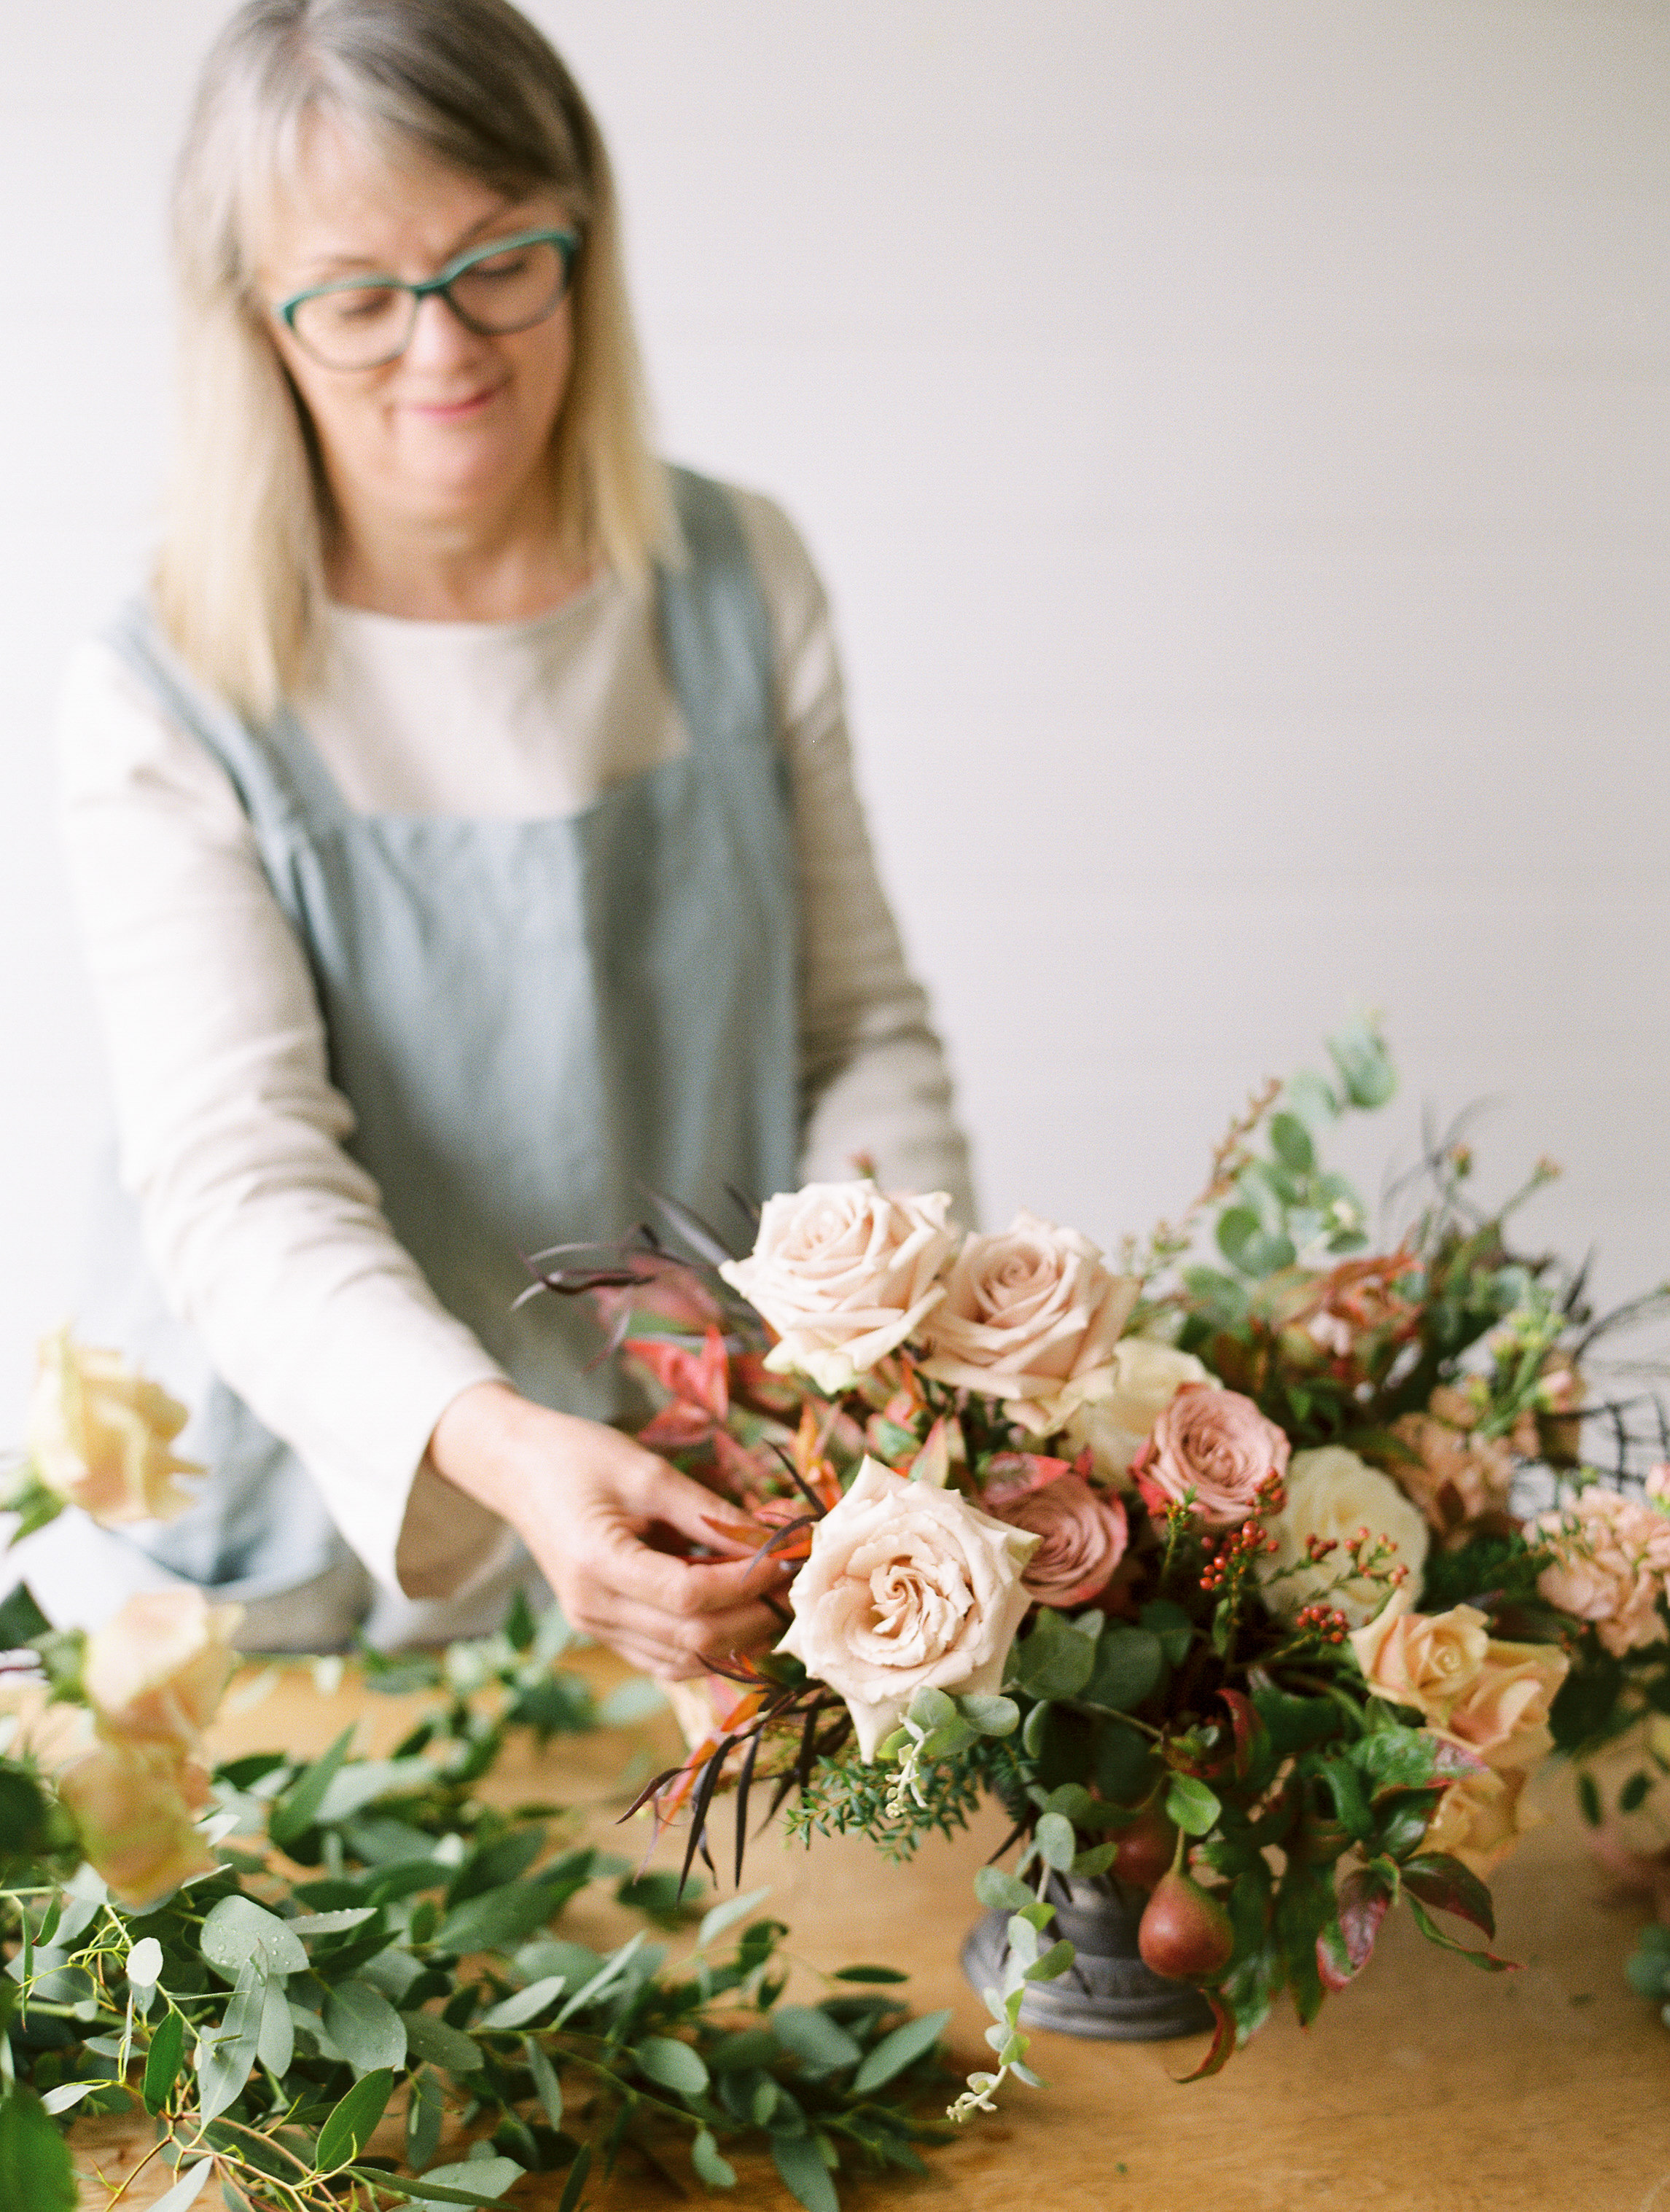 sandra-chau-stylist-floral-florist-branding-lifestyle-shoot-we-are-origami204.jpg